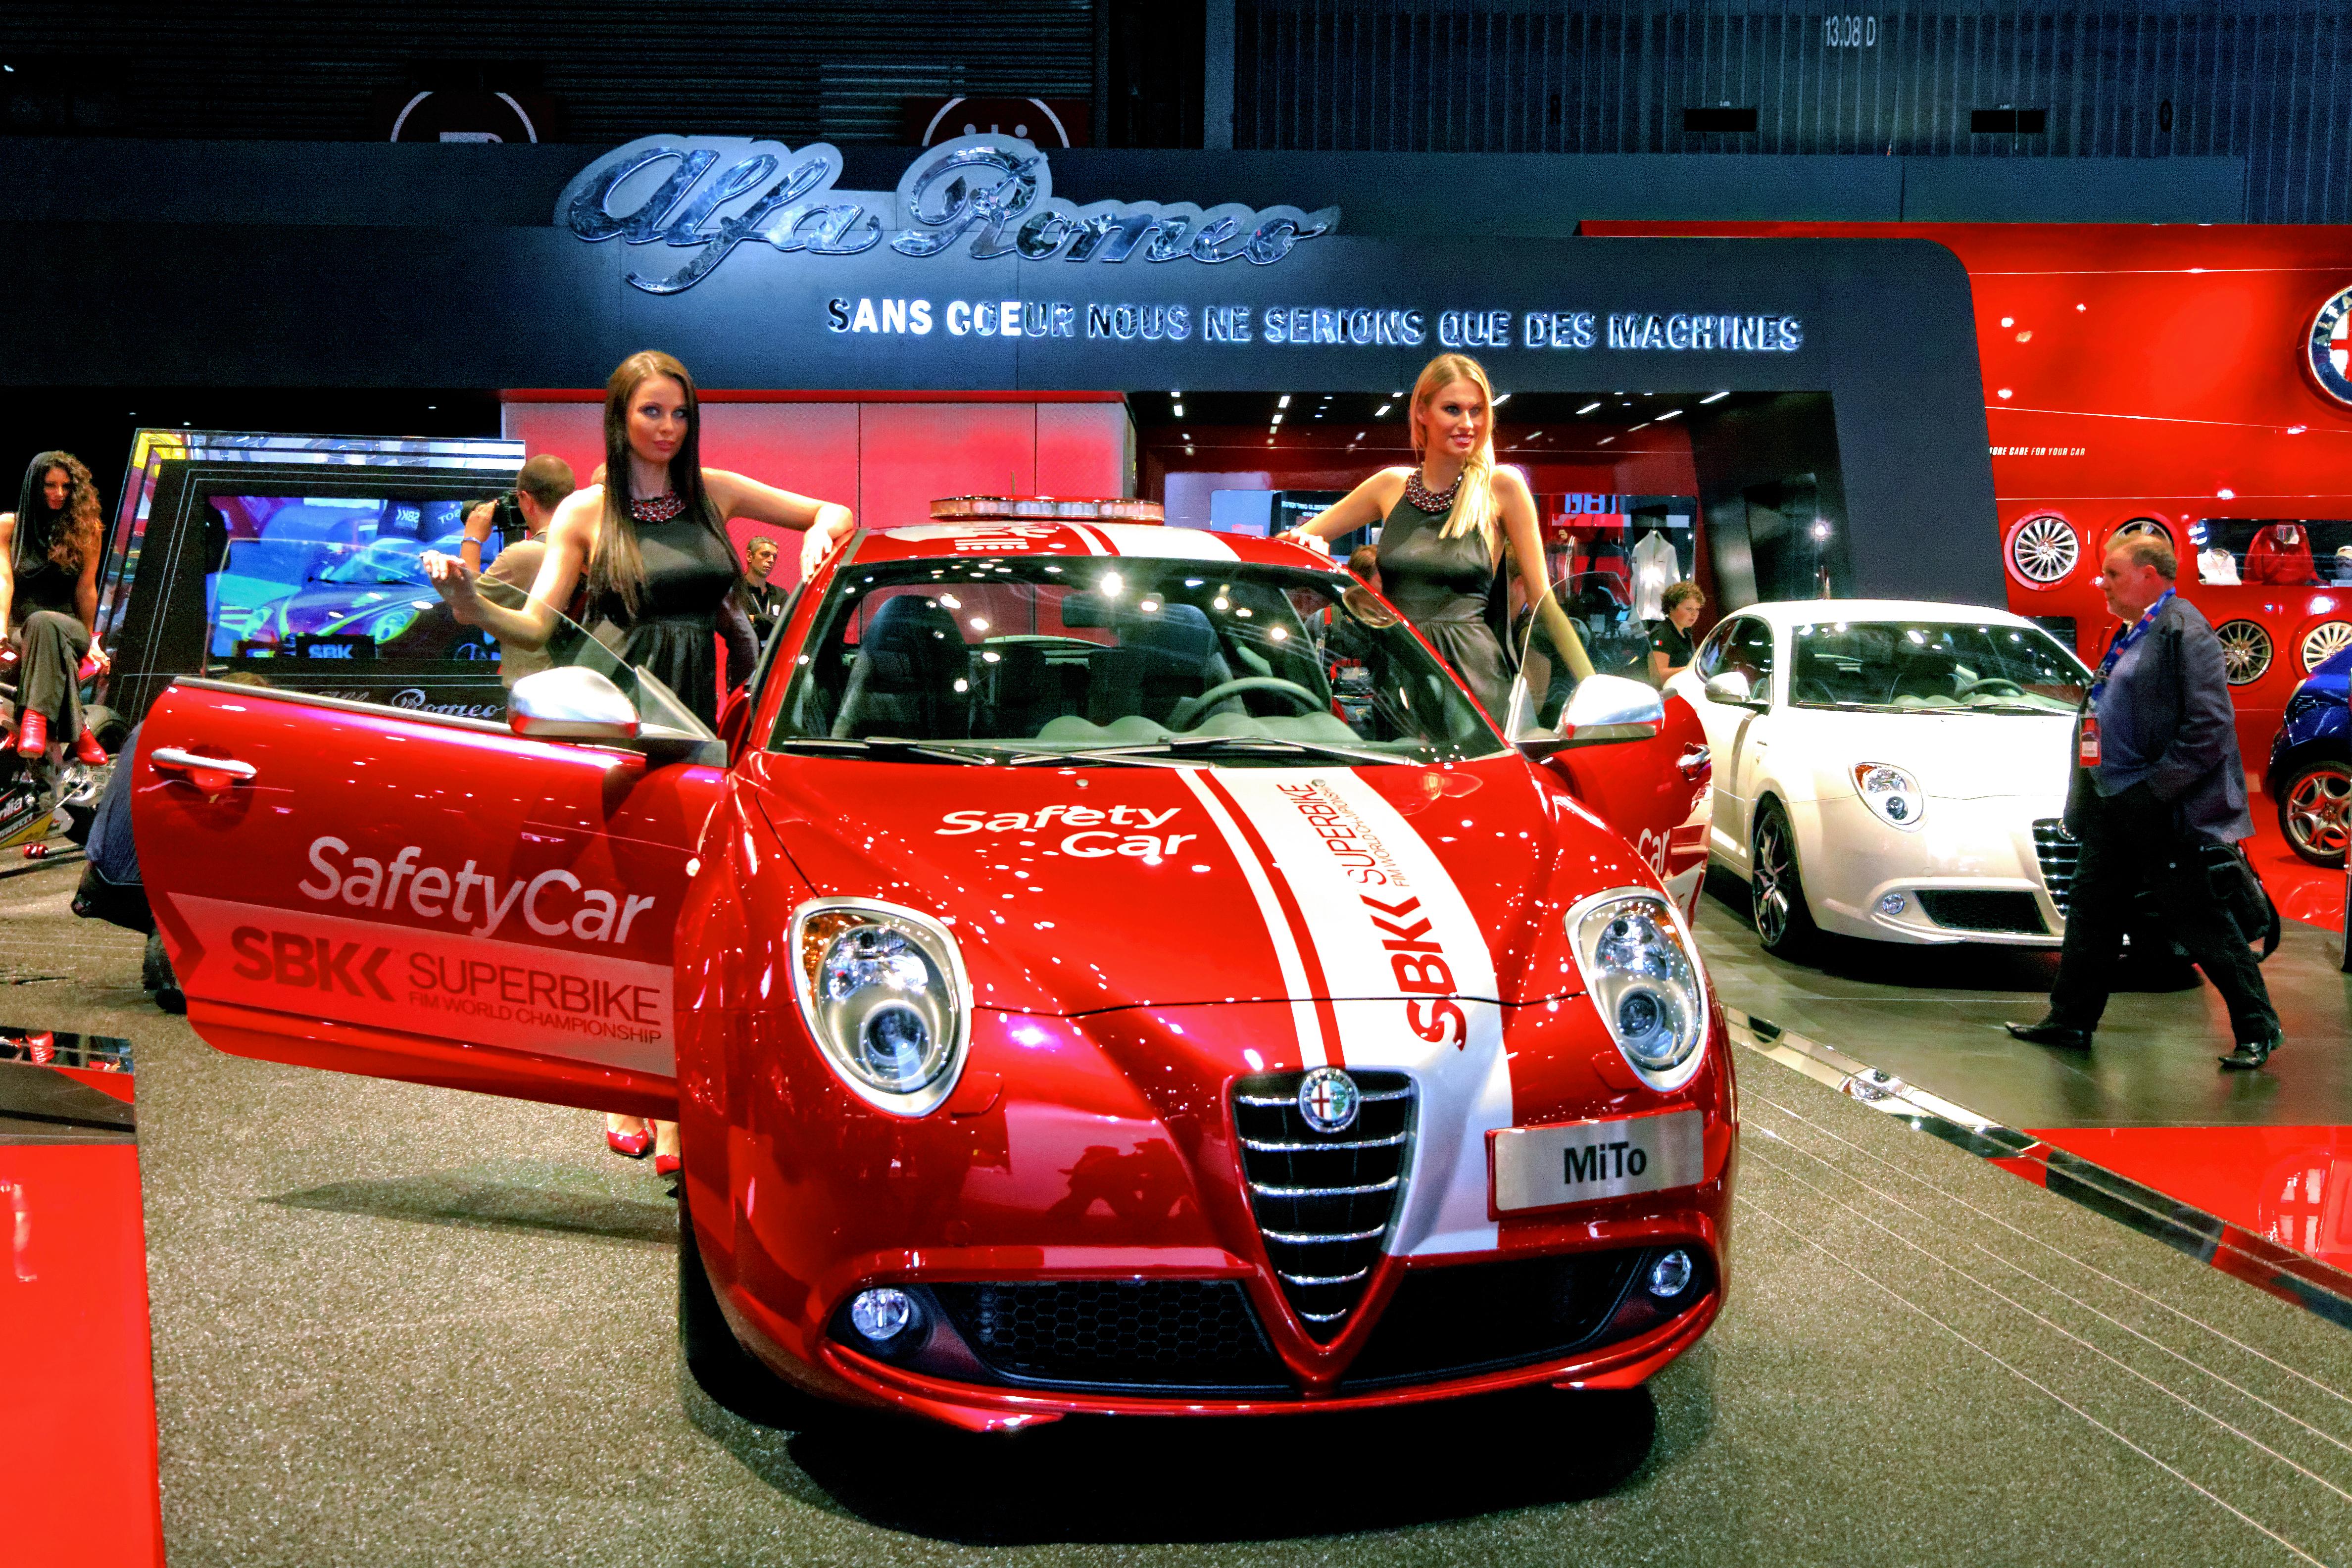 file:alfa romeo mito - mondial de l'automobile de paris 2012 - 011